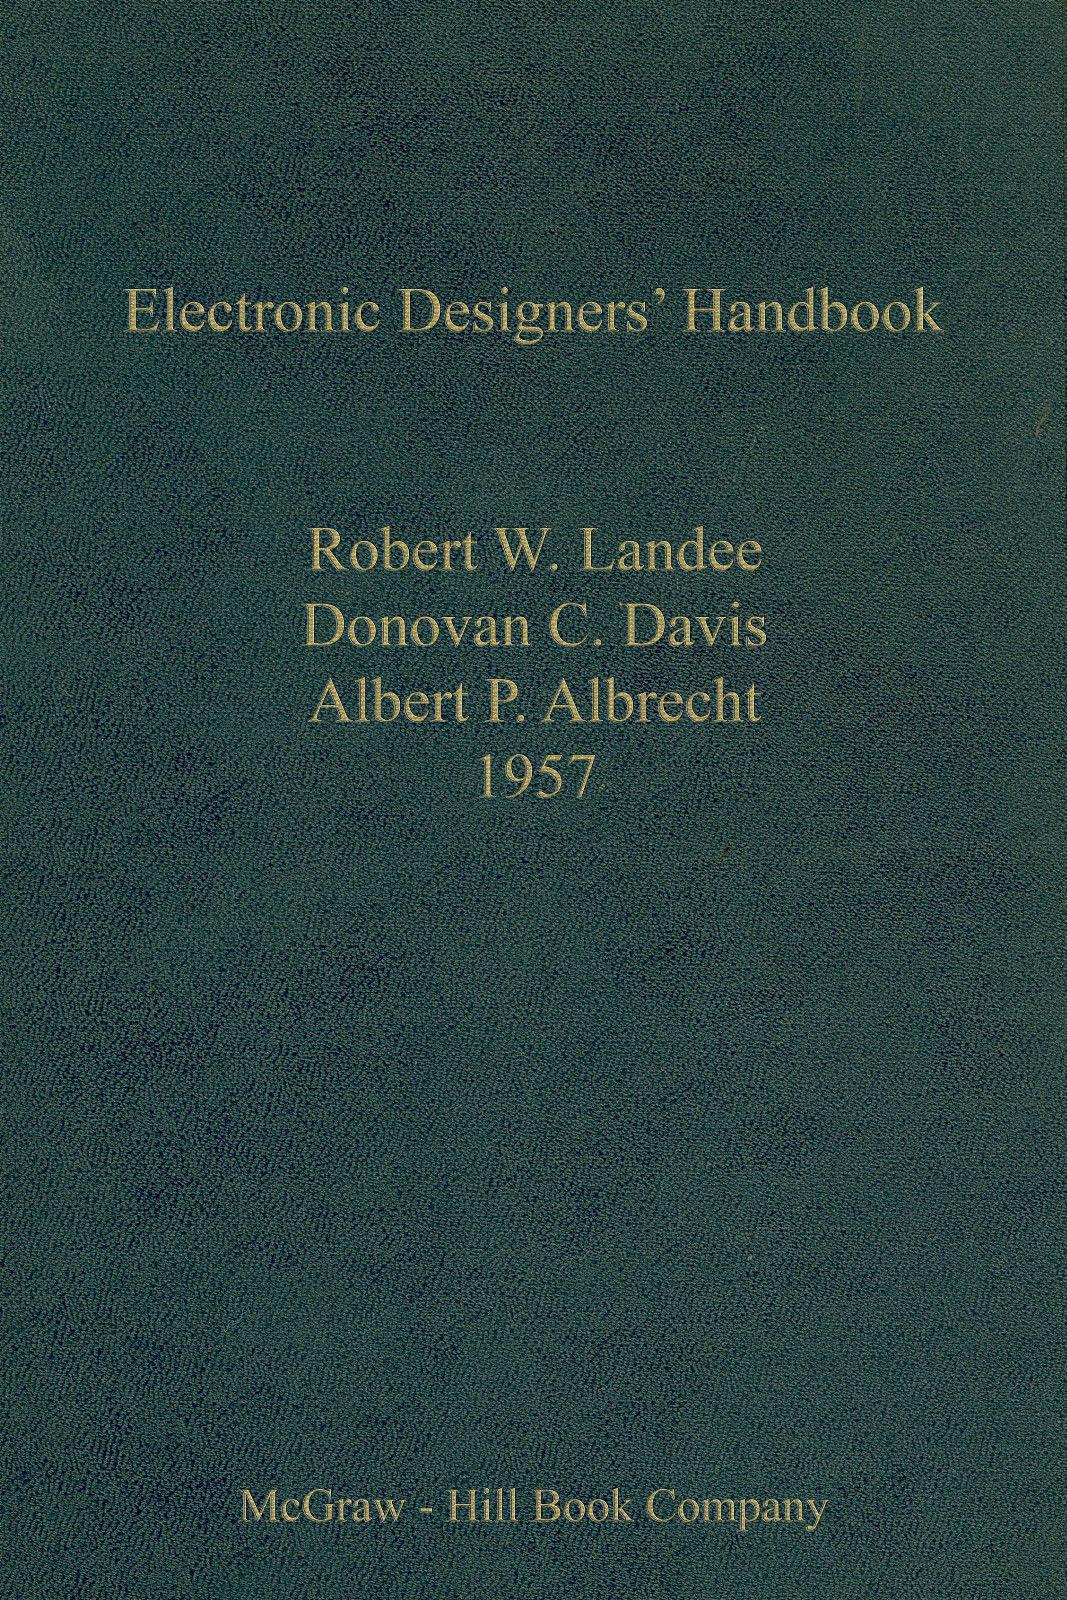 Electronic Designers Handbook 1957 Tube Compressors Filter Circuits 295 Gbp Etc